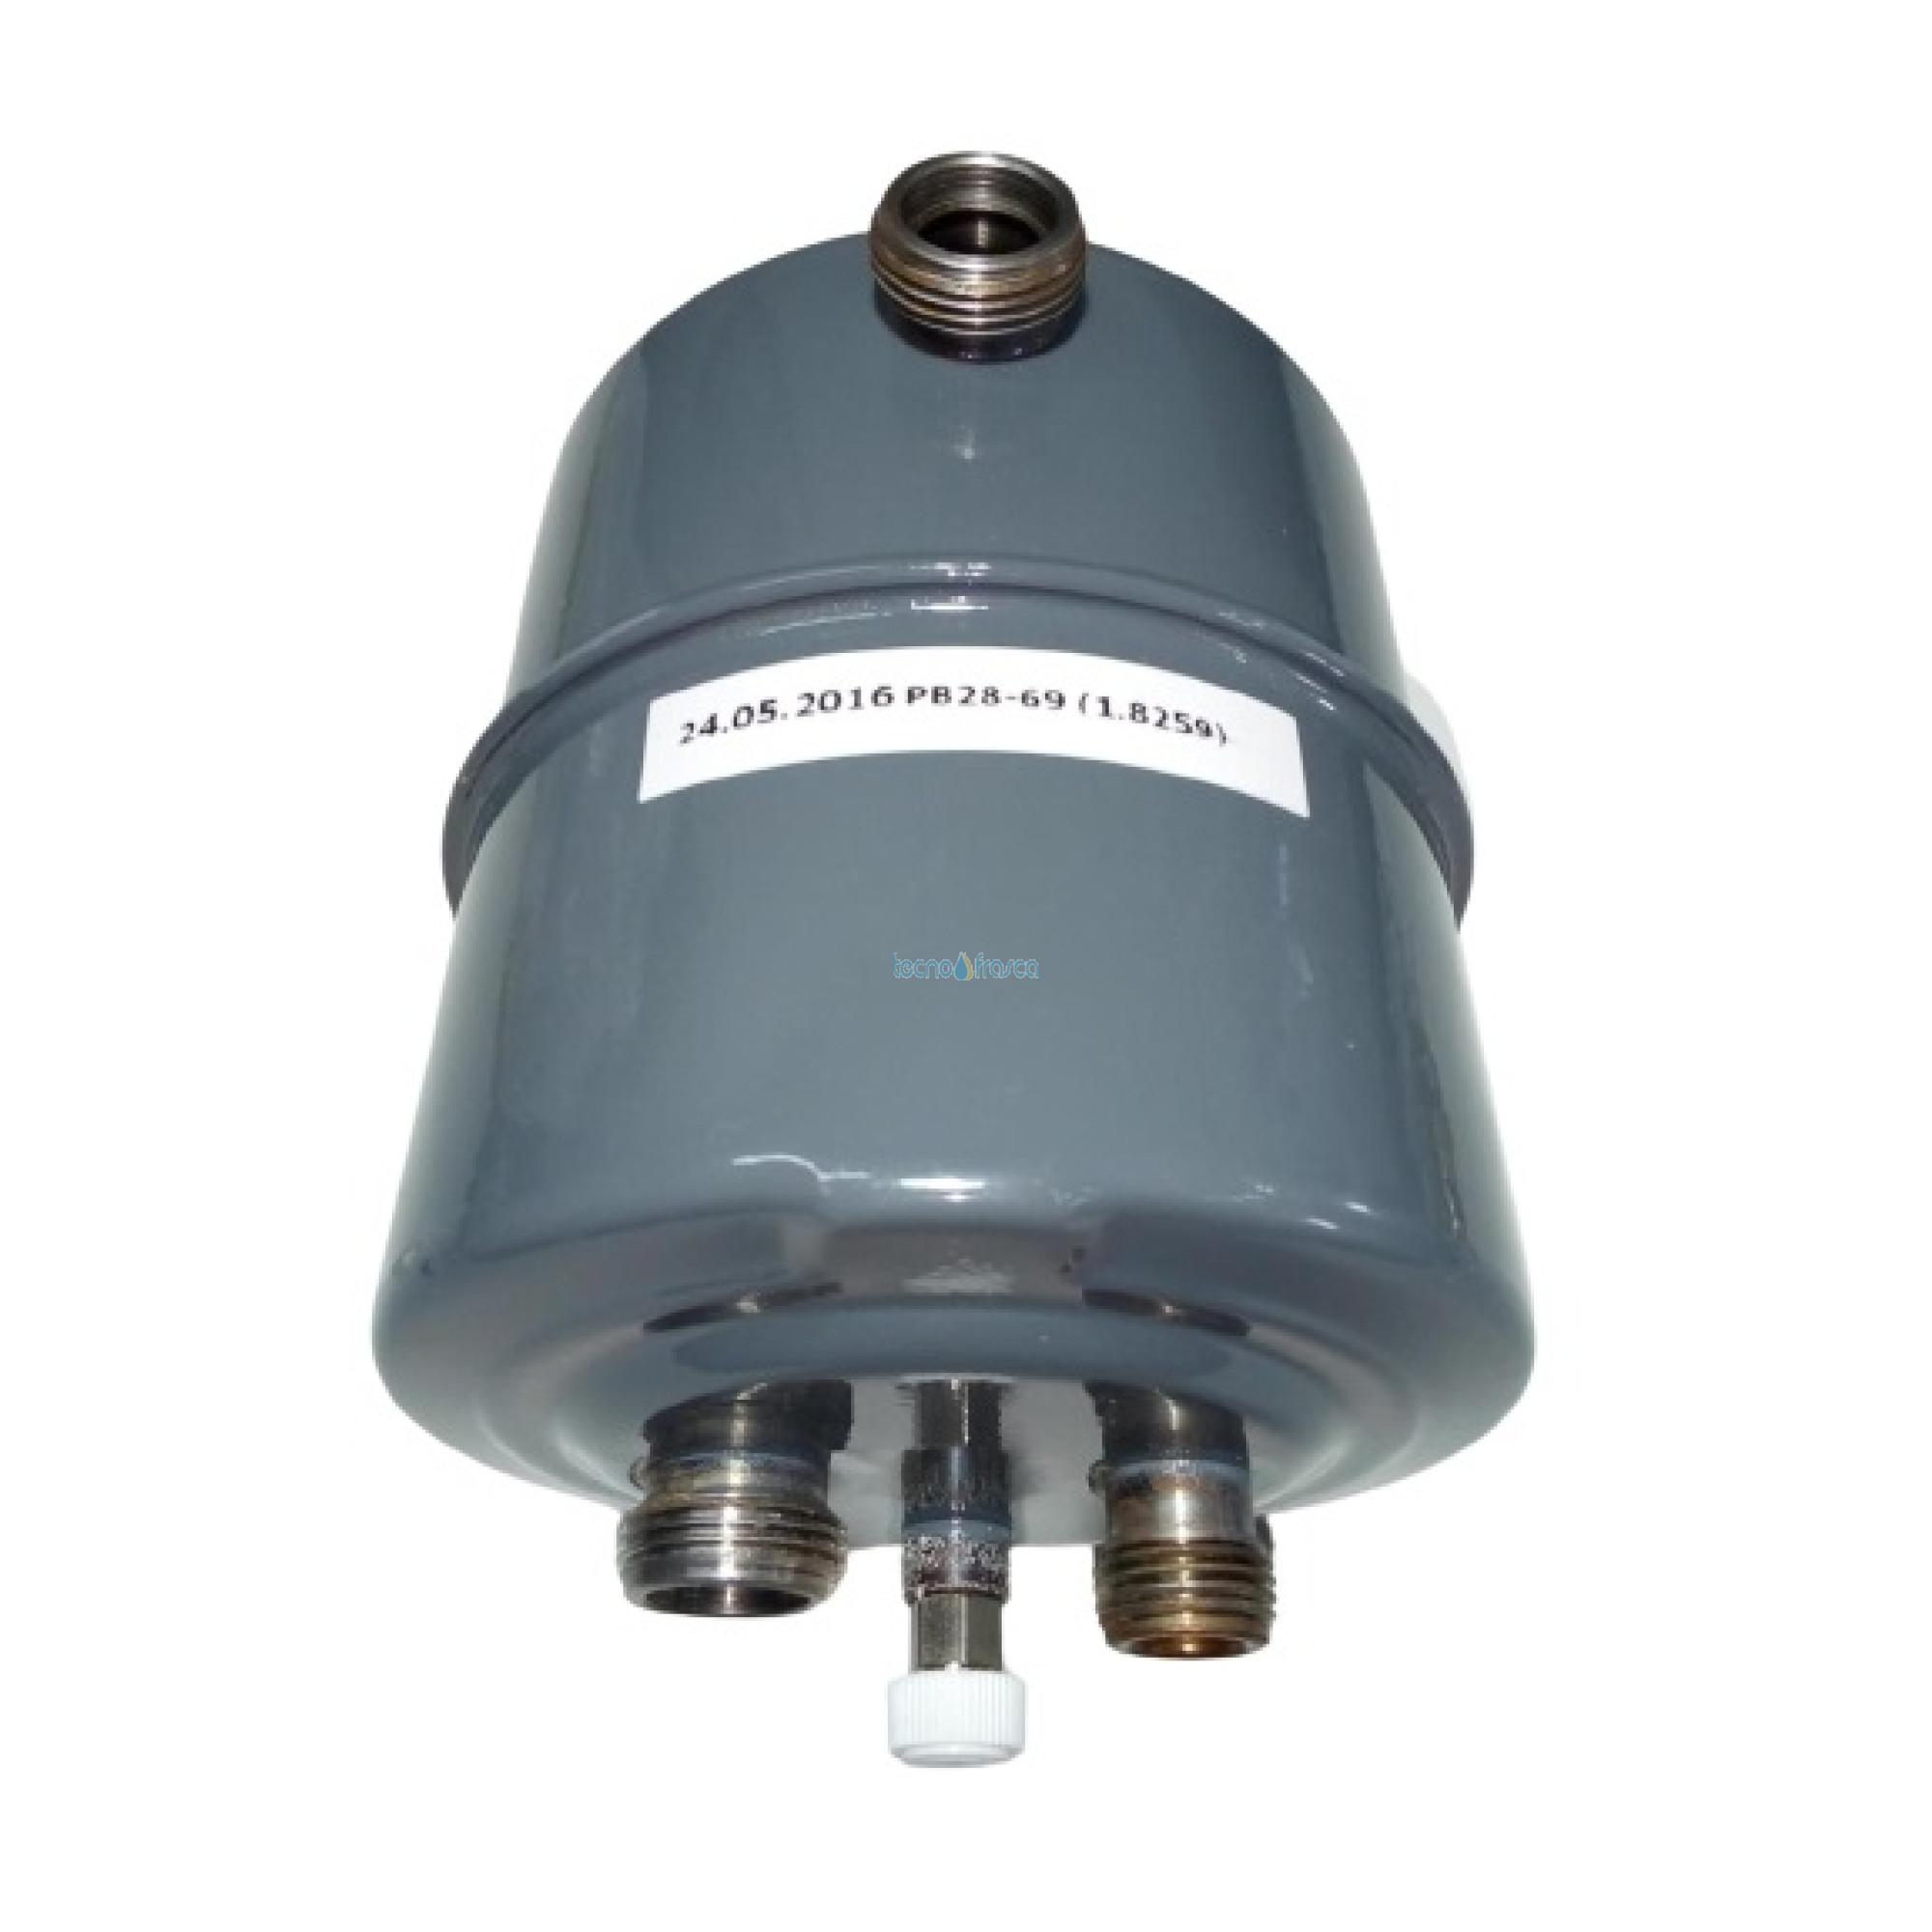 Immergas boilerino nike/eolo 1.8259